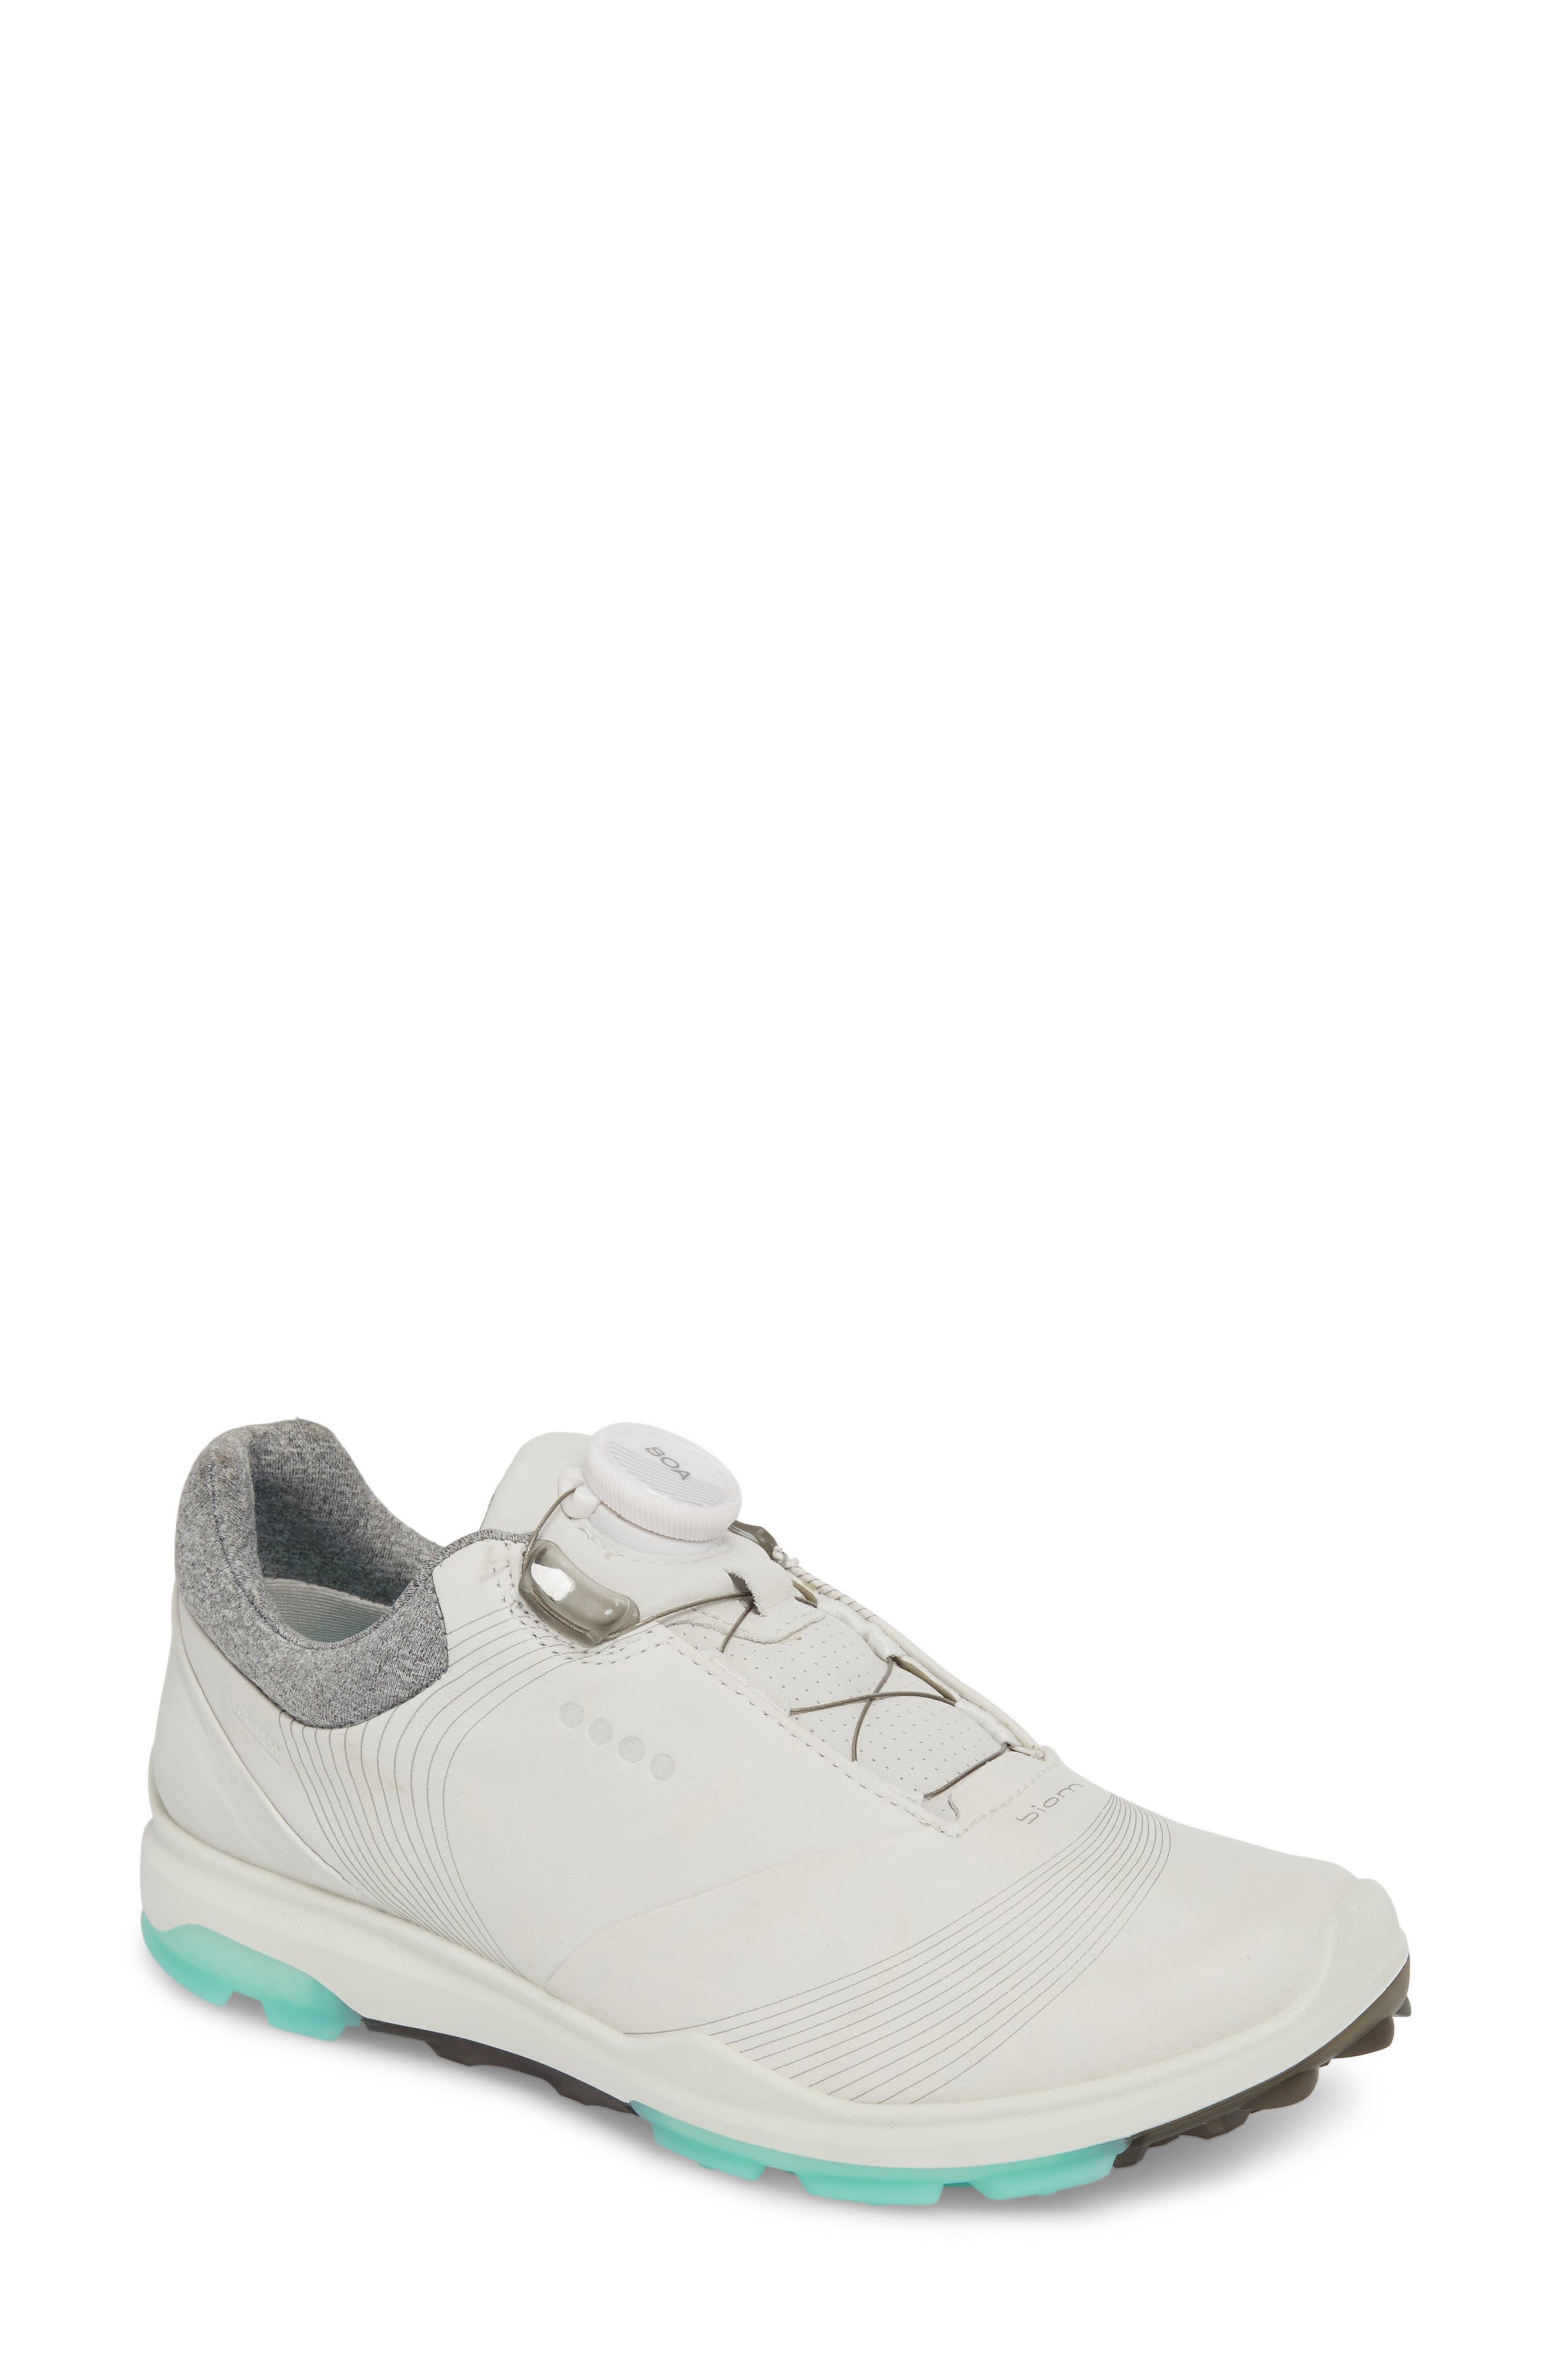 Ecco Golf Biom Hybrid 3 Sneaker, White